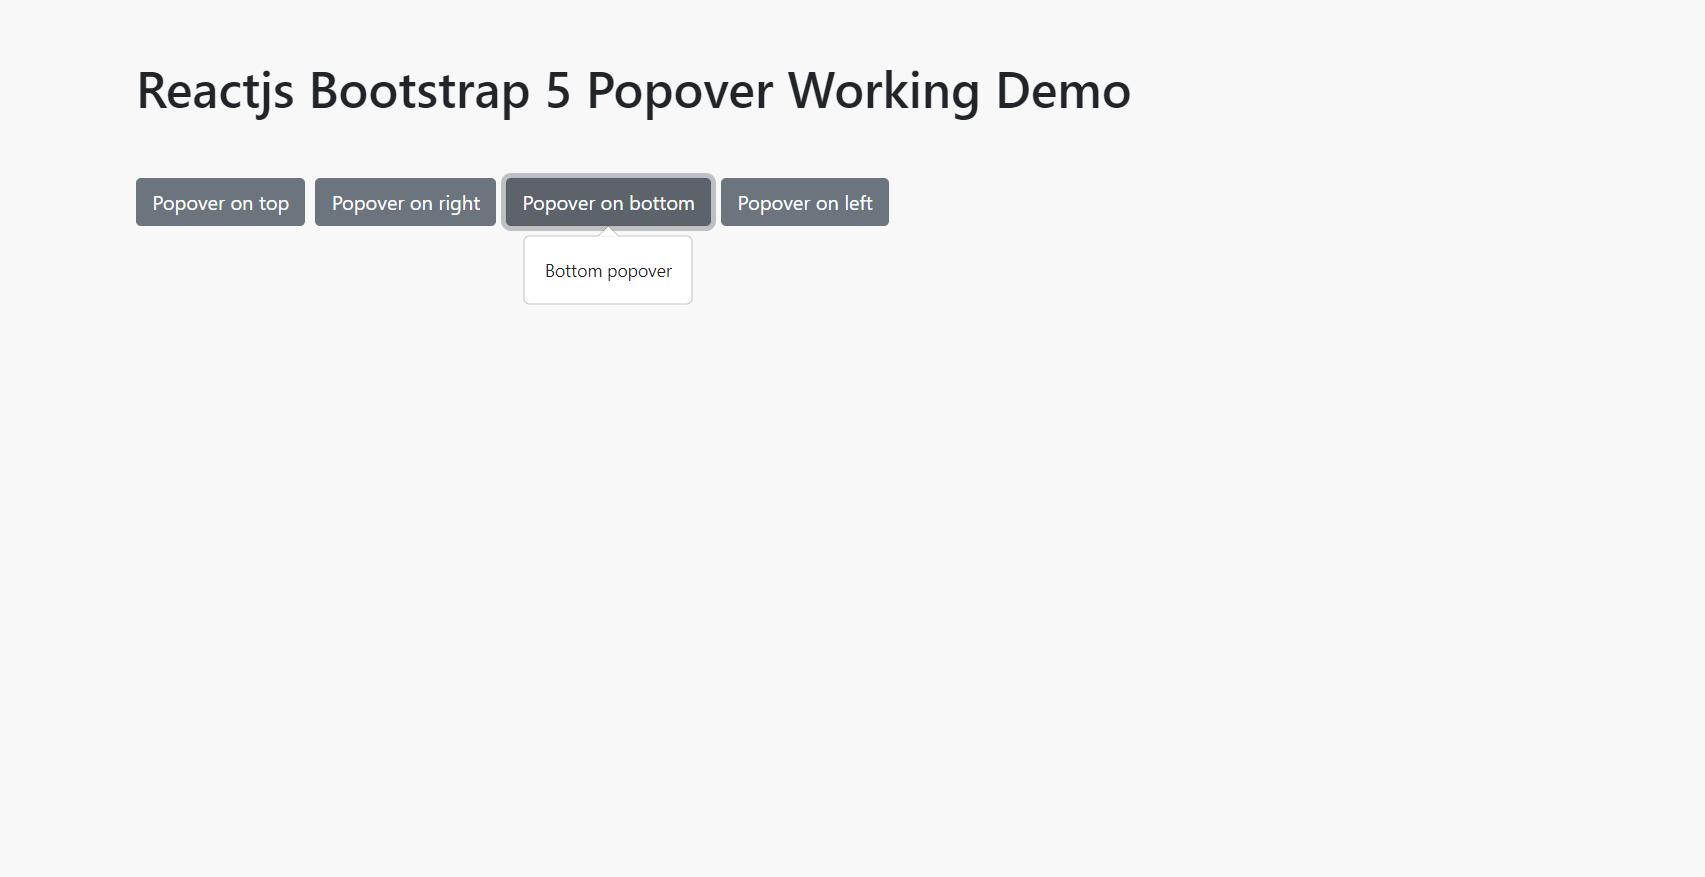 Reactjs Bootstrap 5 Popover Working Demo